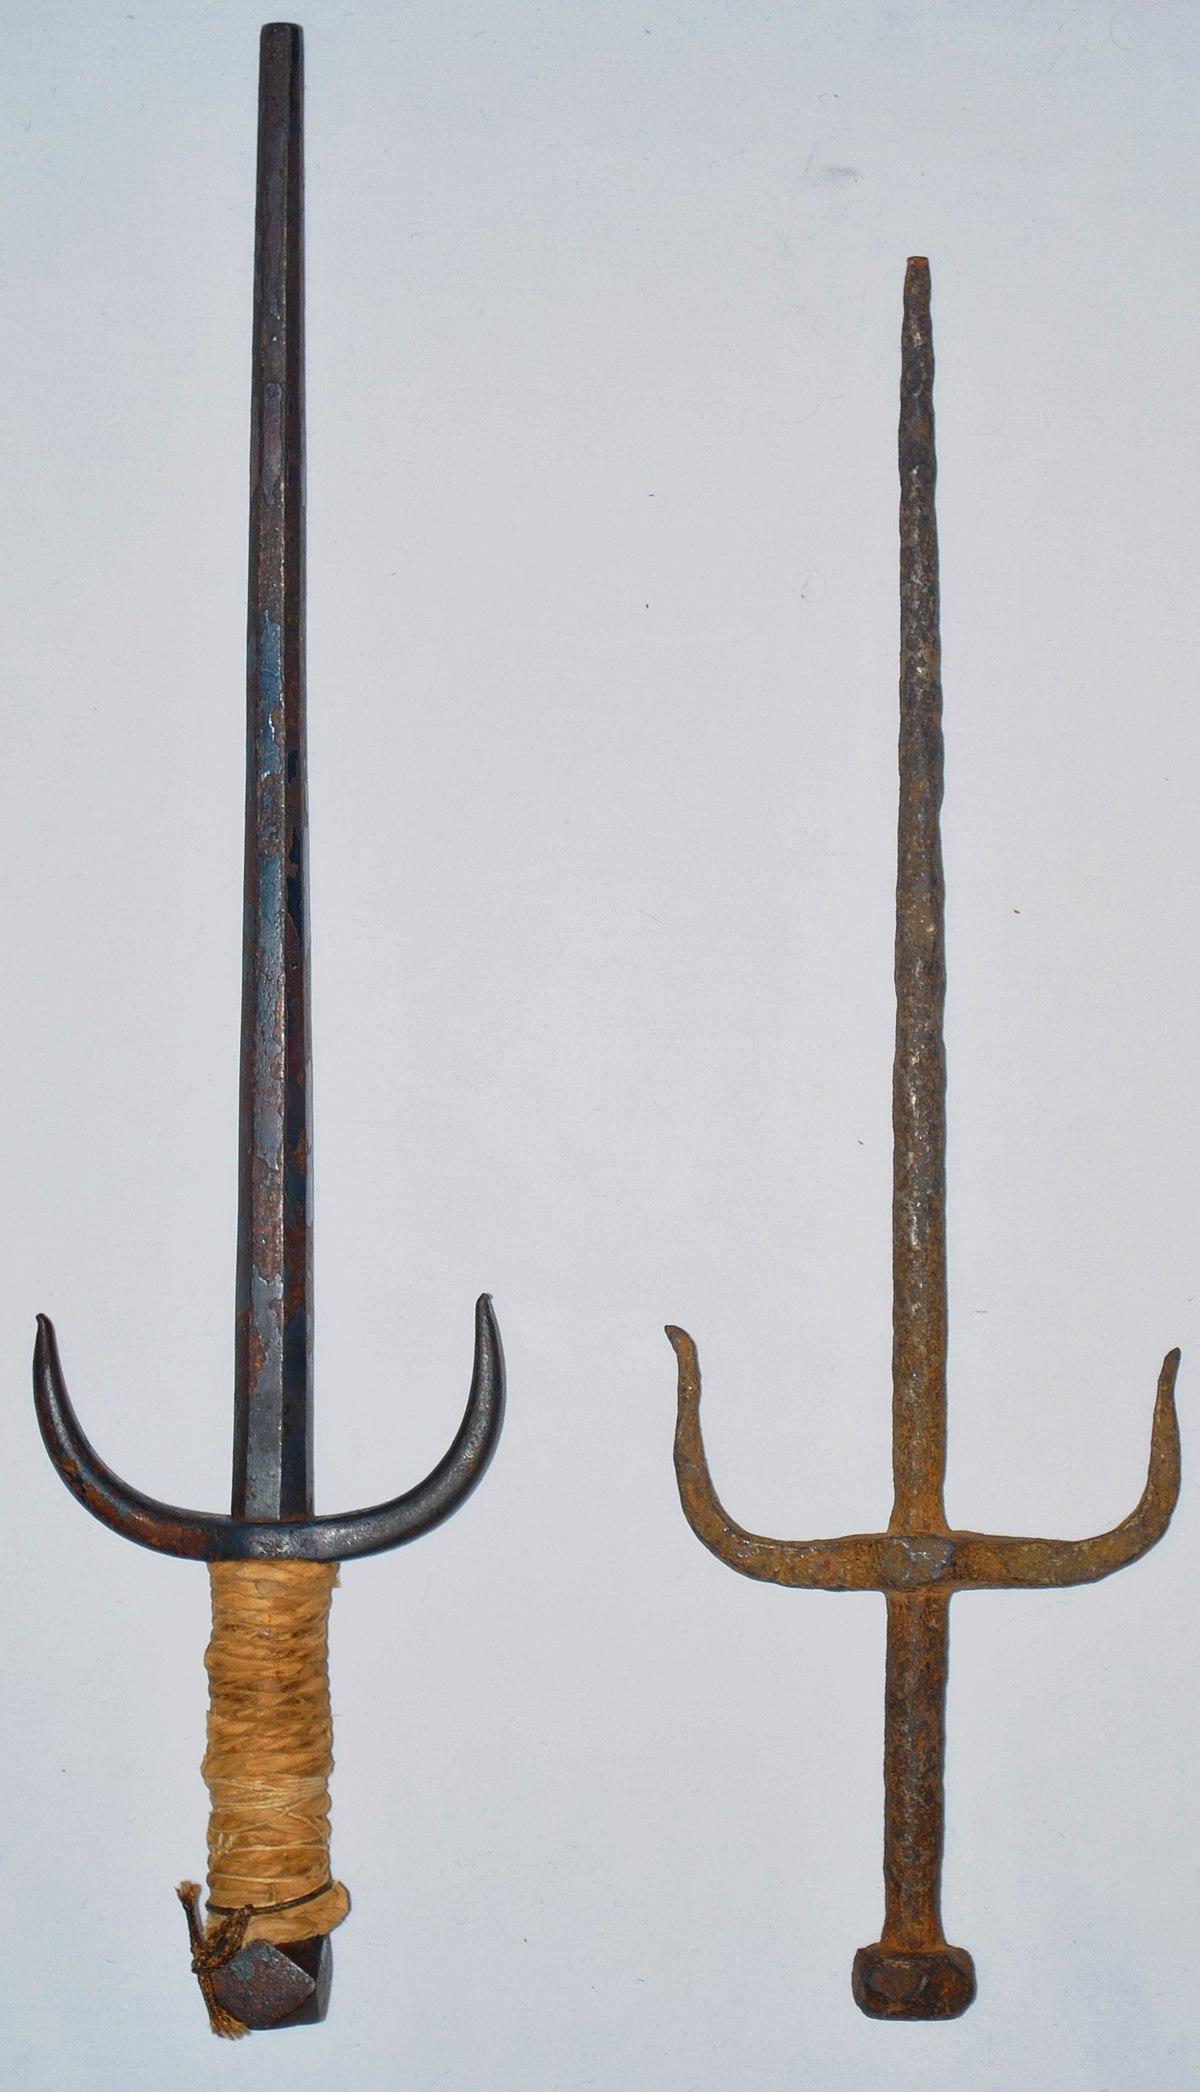 Sai (weapon) - Wikipedia